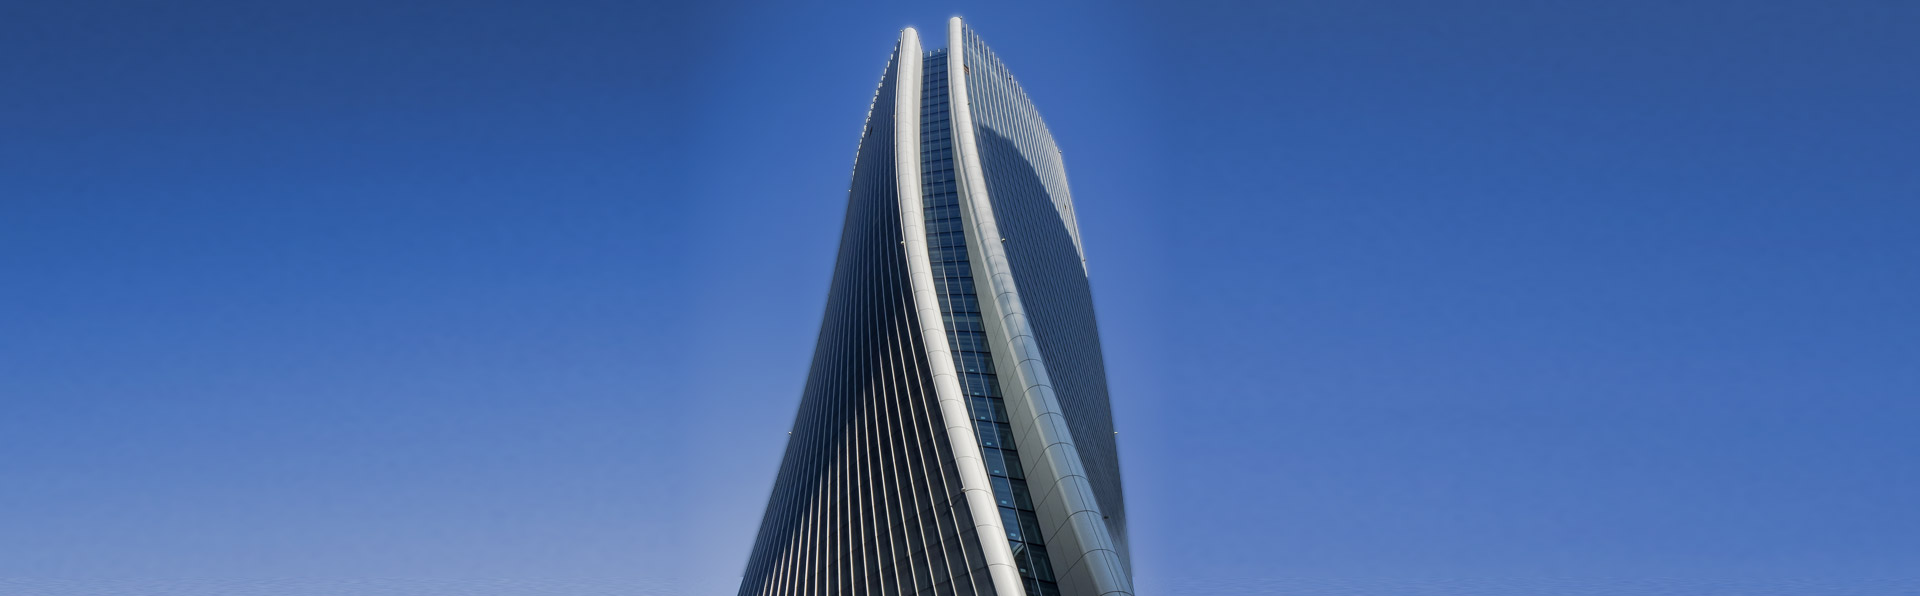 torre-hadid-tower